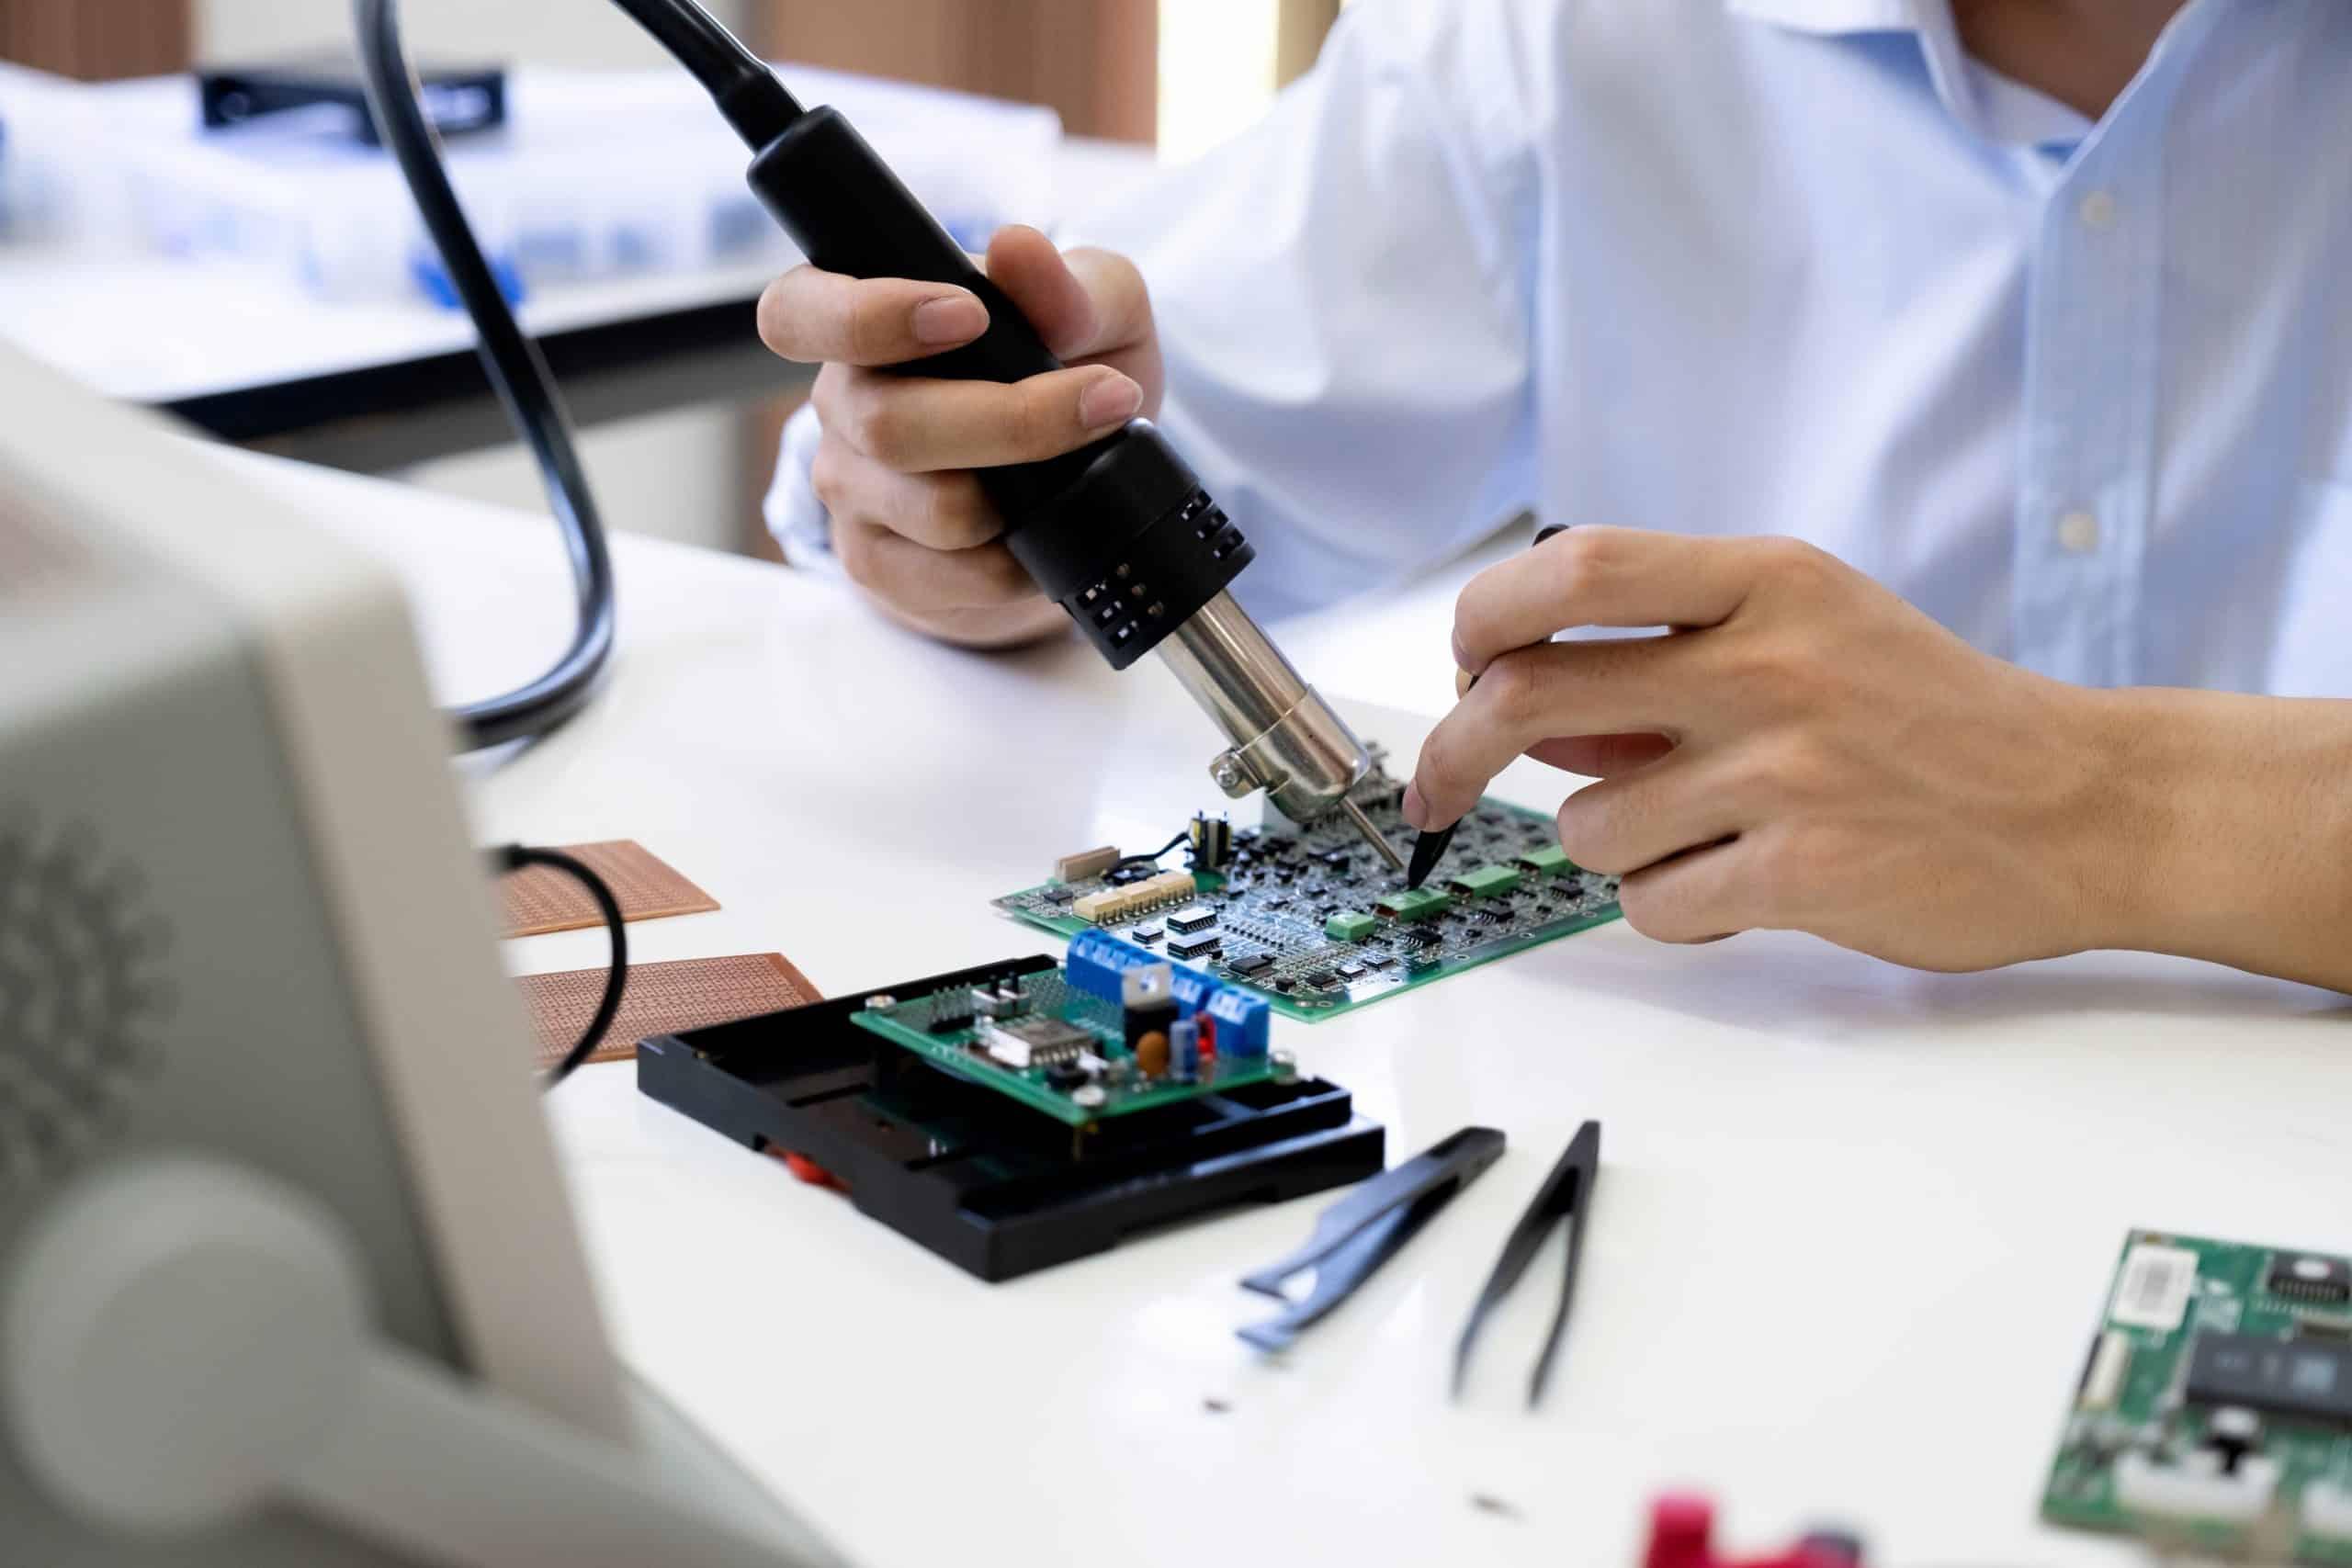 wingate electronics engineer